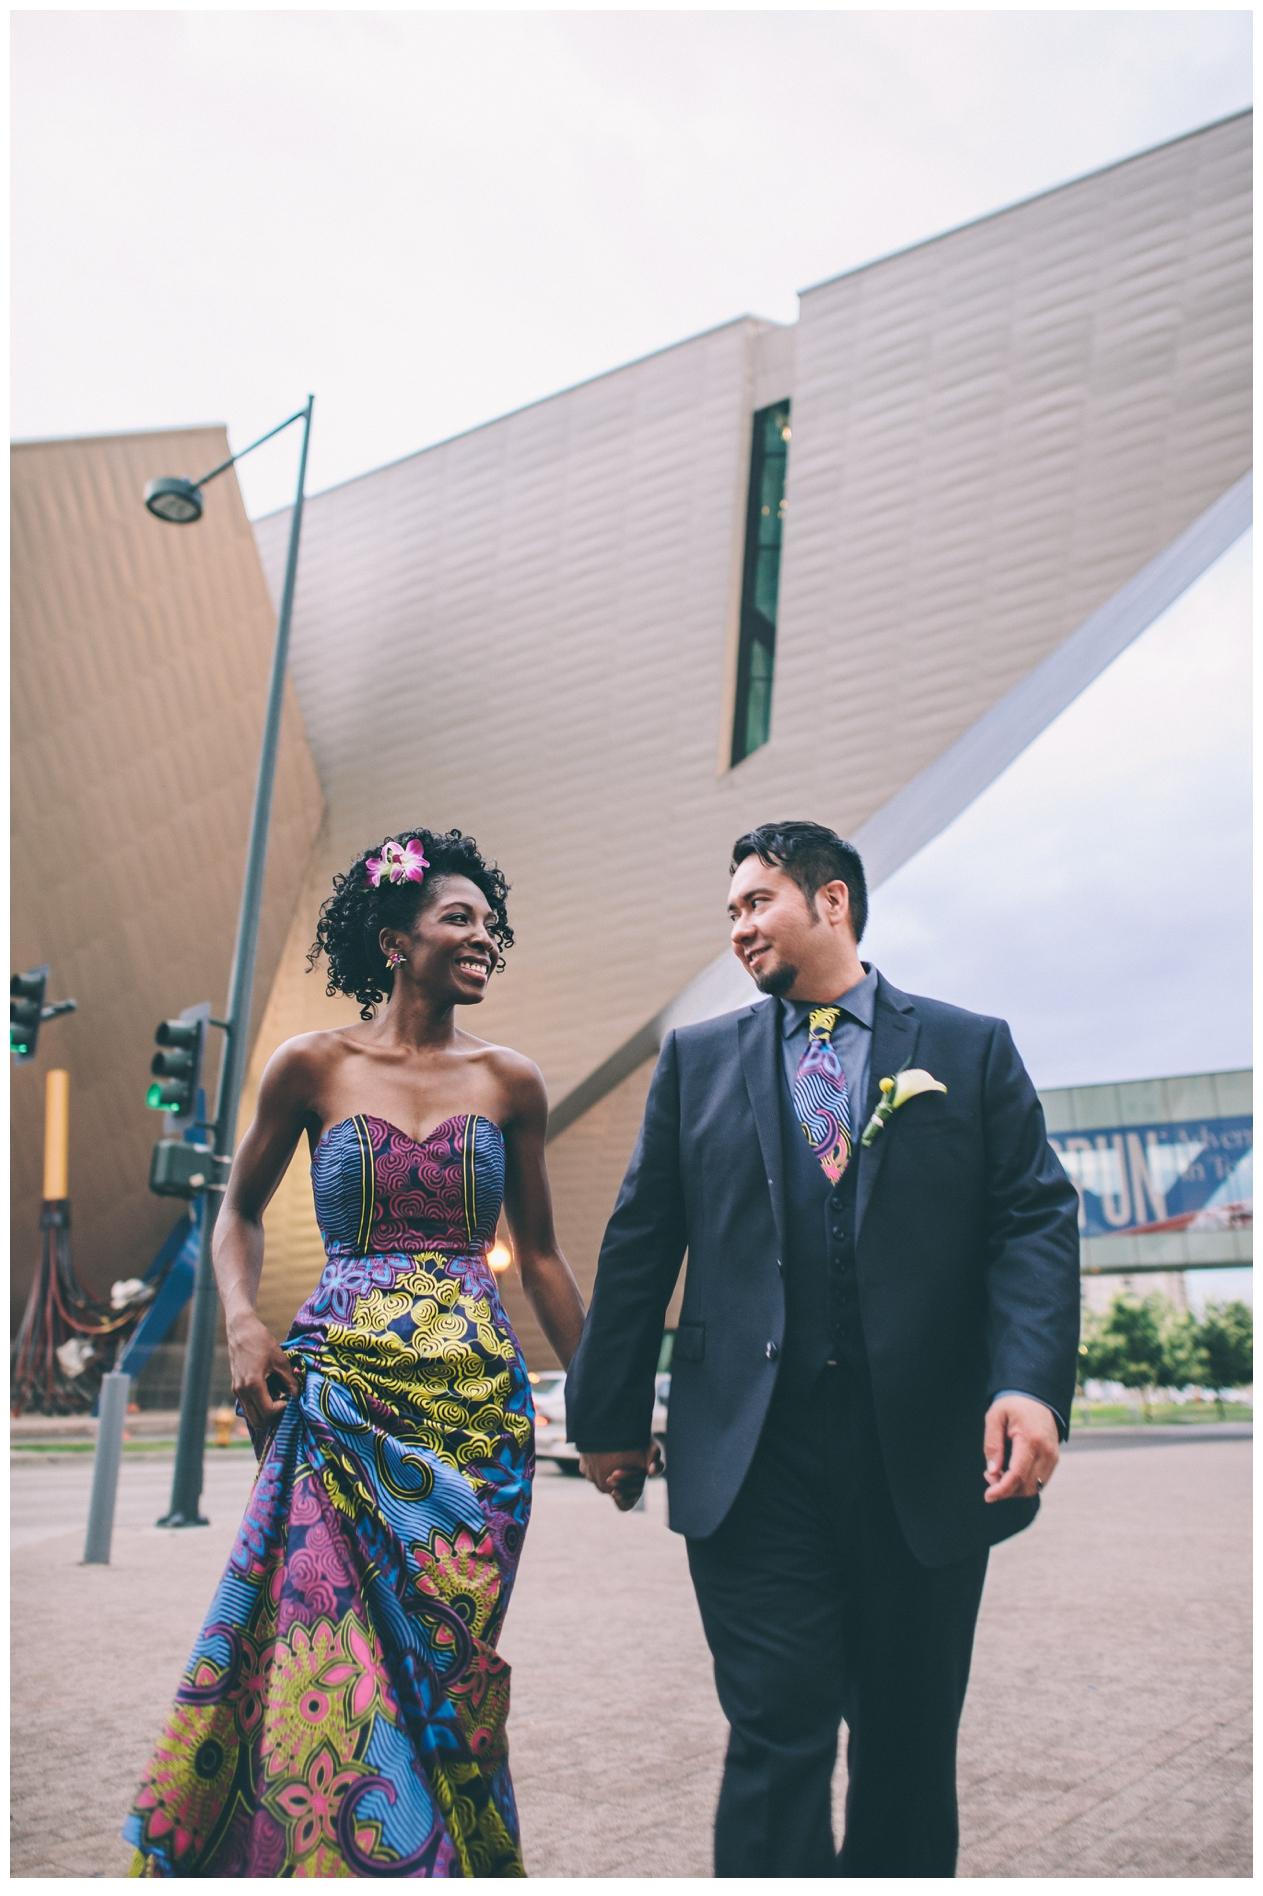 058-AmandaKoppImages-Denver-Wedding-Photo.jpg